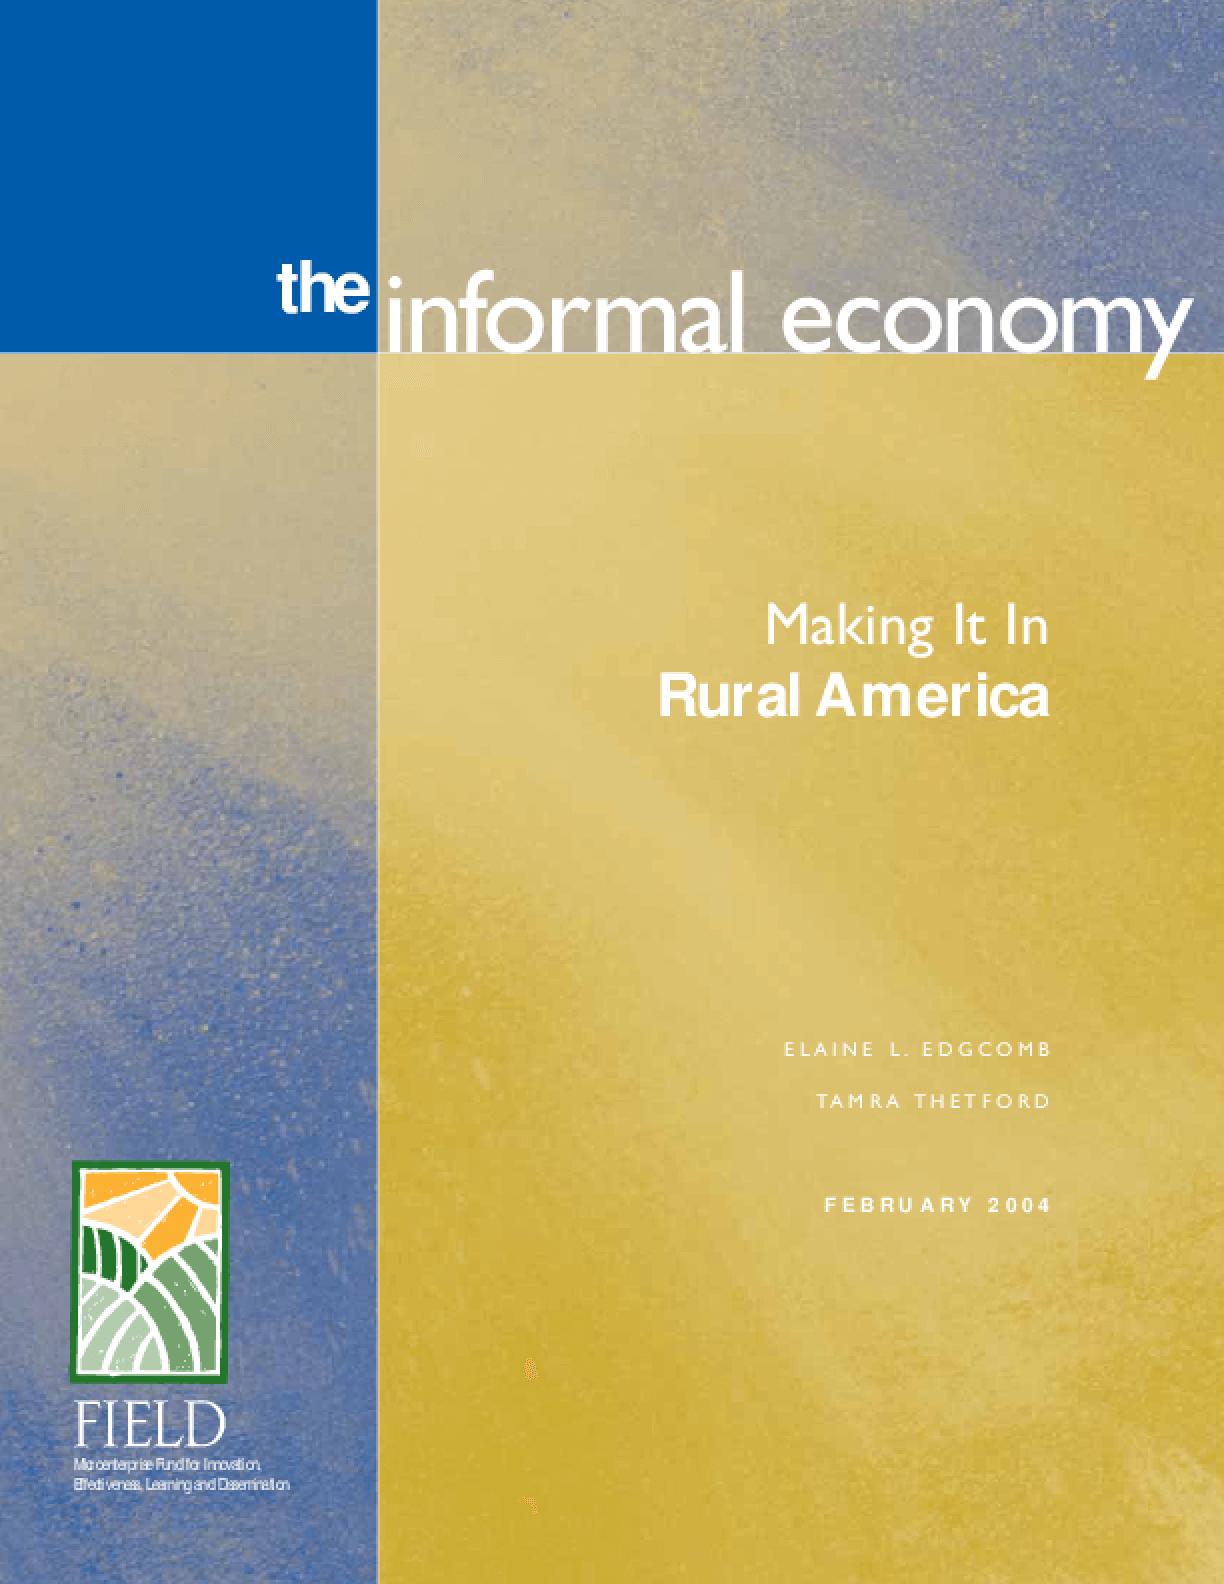 The Informal Economy: Making It in Rural America